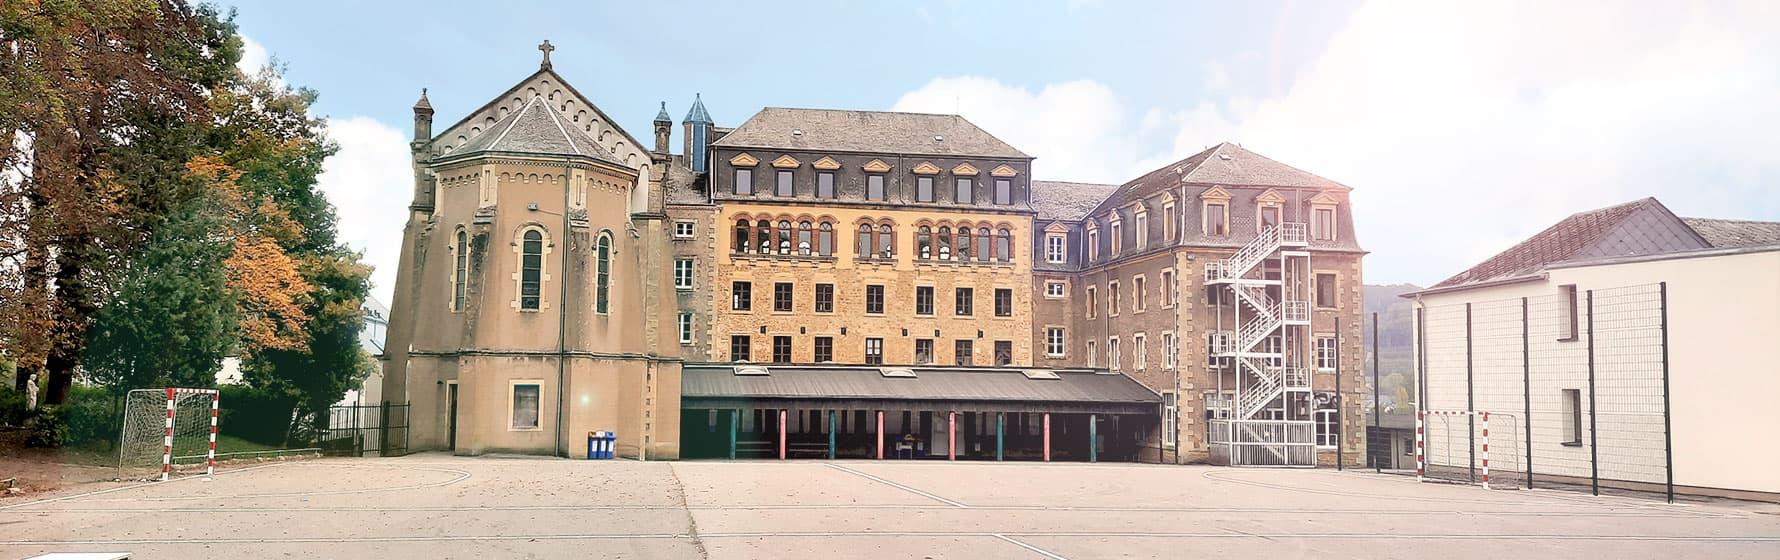 Vue du bâtiment de Differt